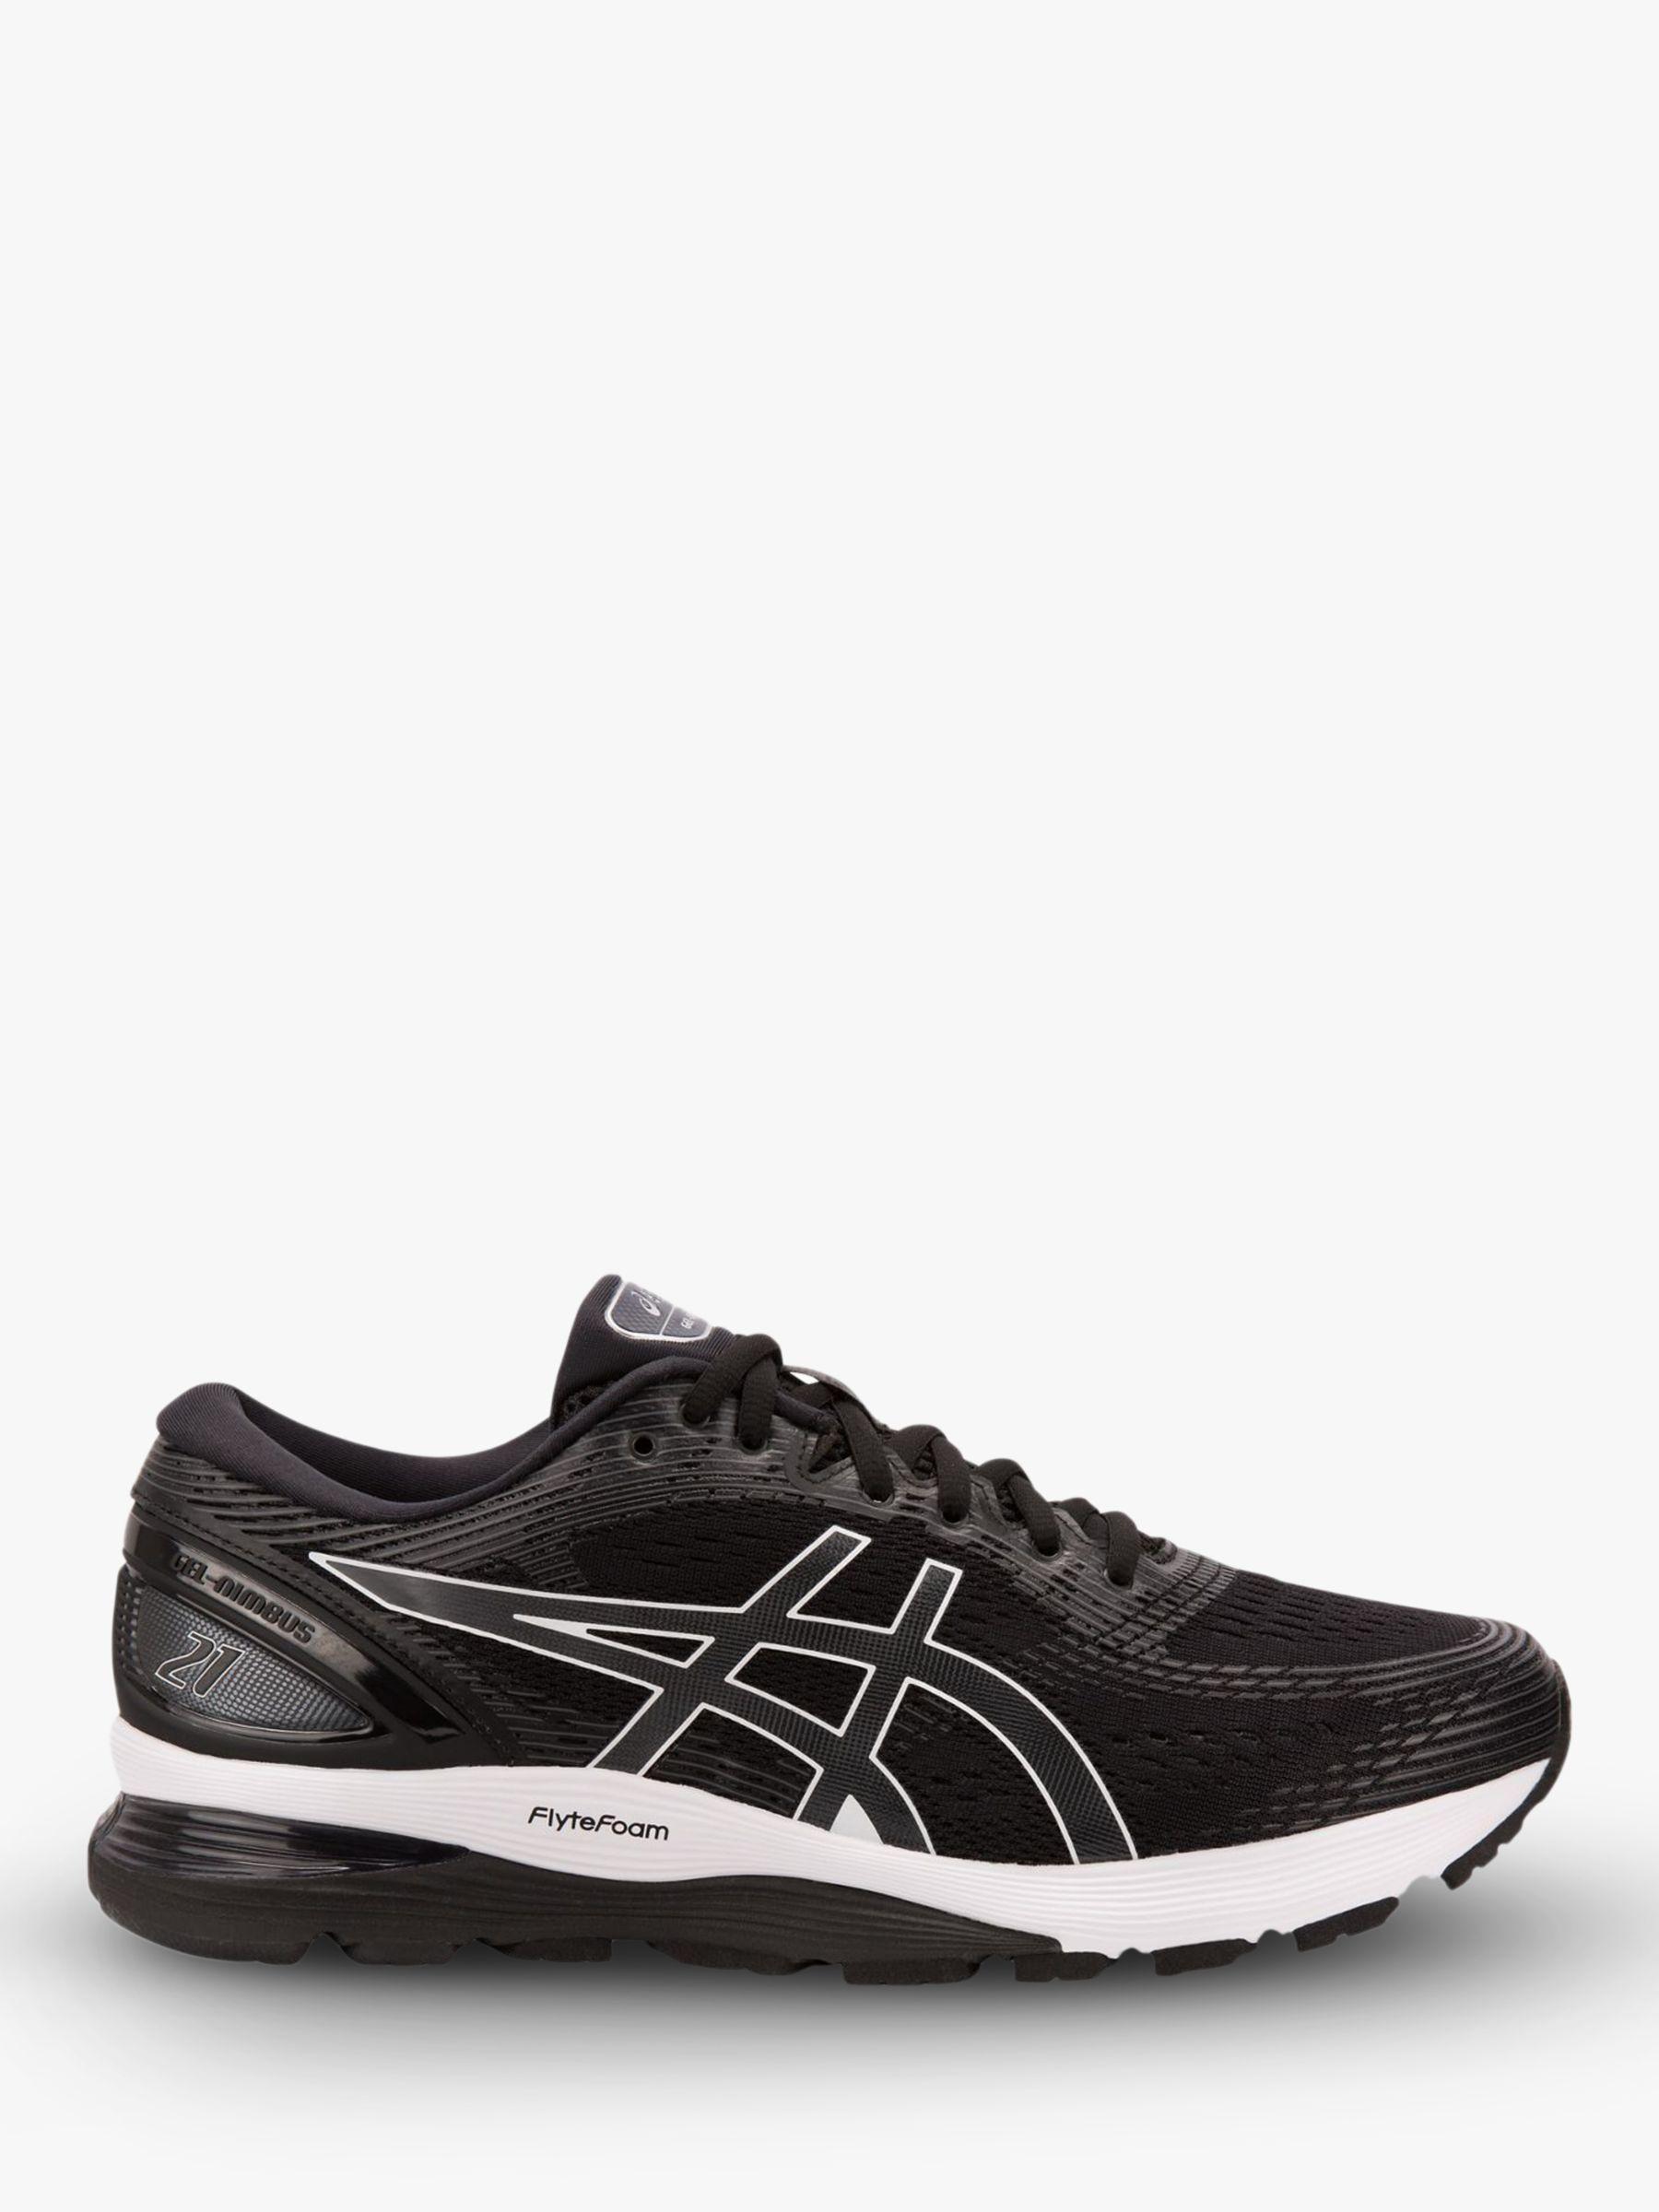 ASICS GEL NIMBUS 21 Men's Running scarpa, BlackDark Grey